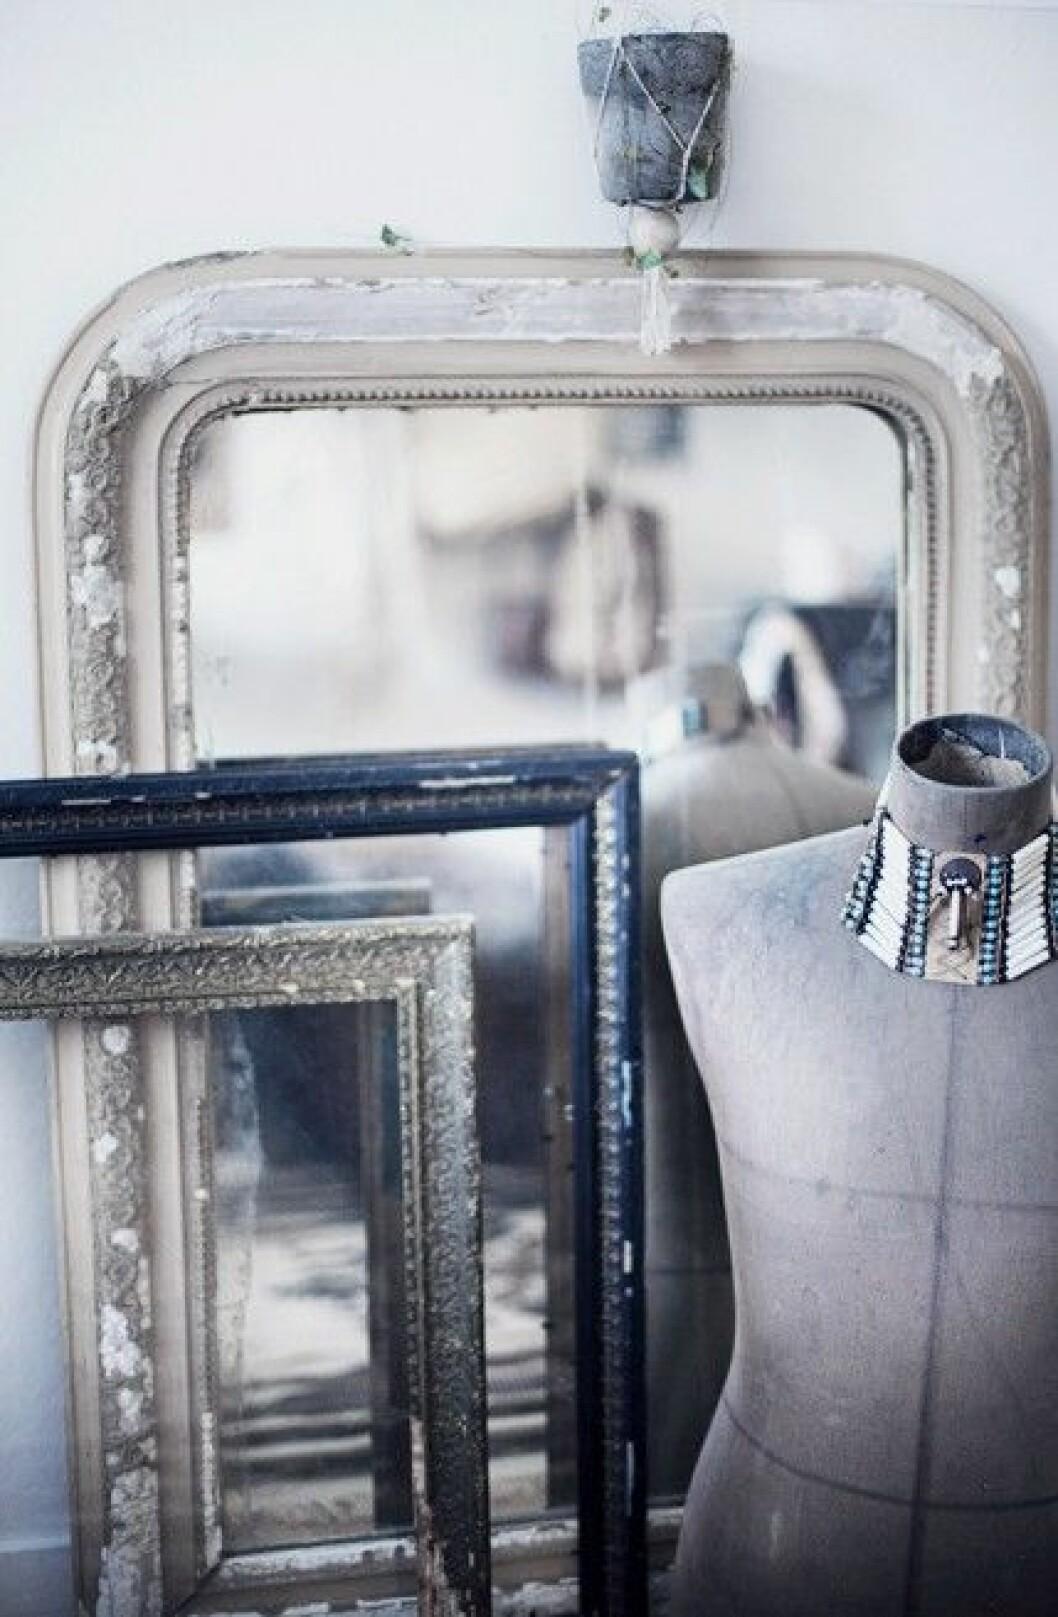 hemma-©-Anna-Malmberg-gamla ramar spegel inspiration